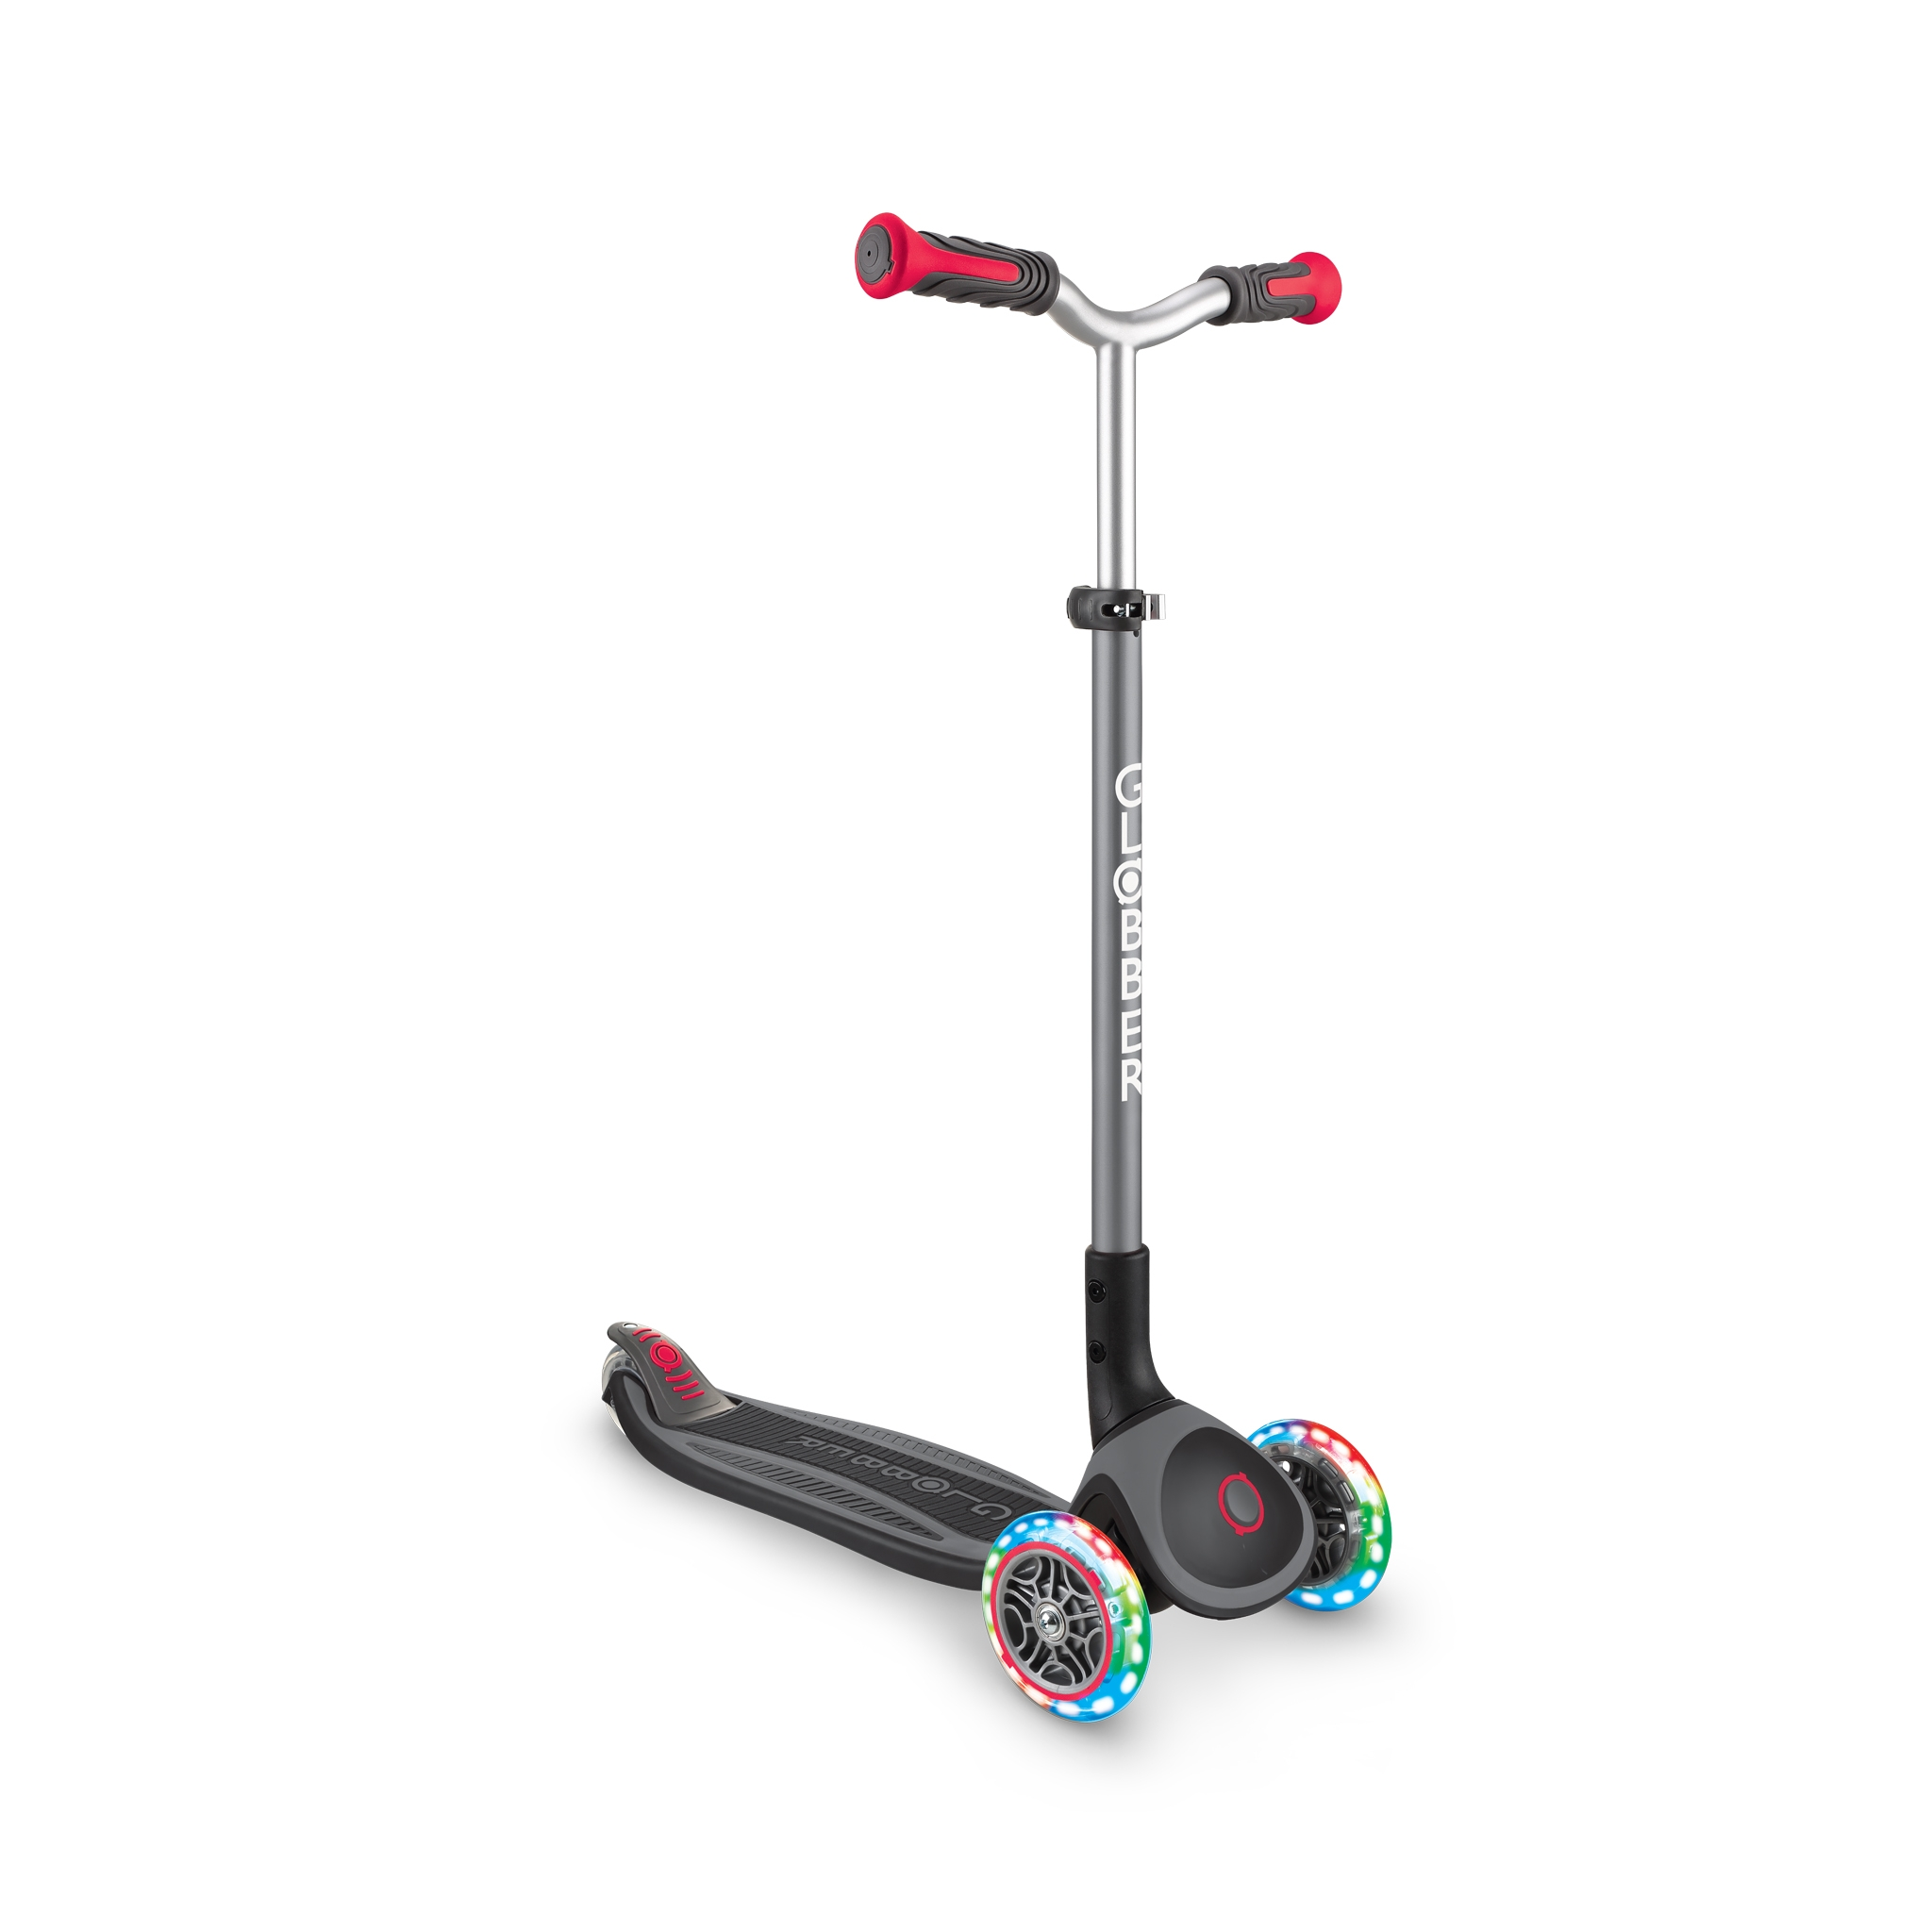 Globber-MASTER-LIGHTS-premium-3-wheel-foldable-light-up-scooter-for-kids-aged-4-to-14_black-red 4